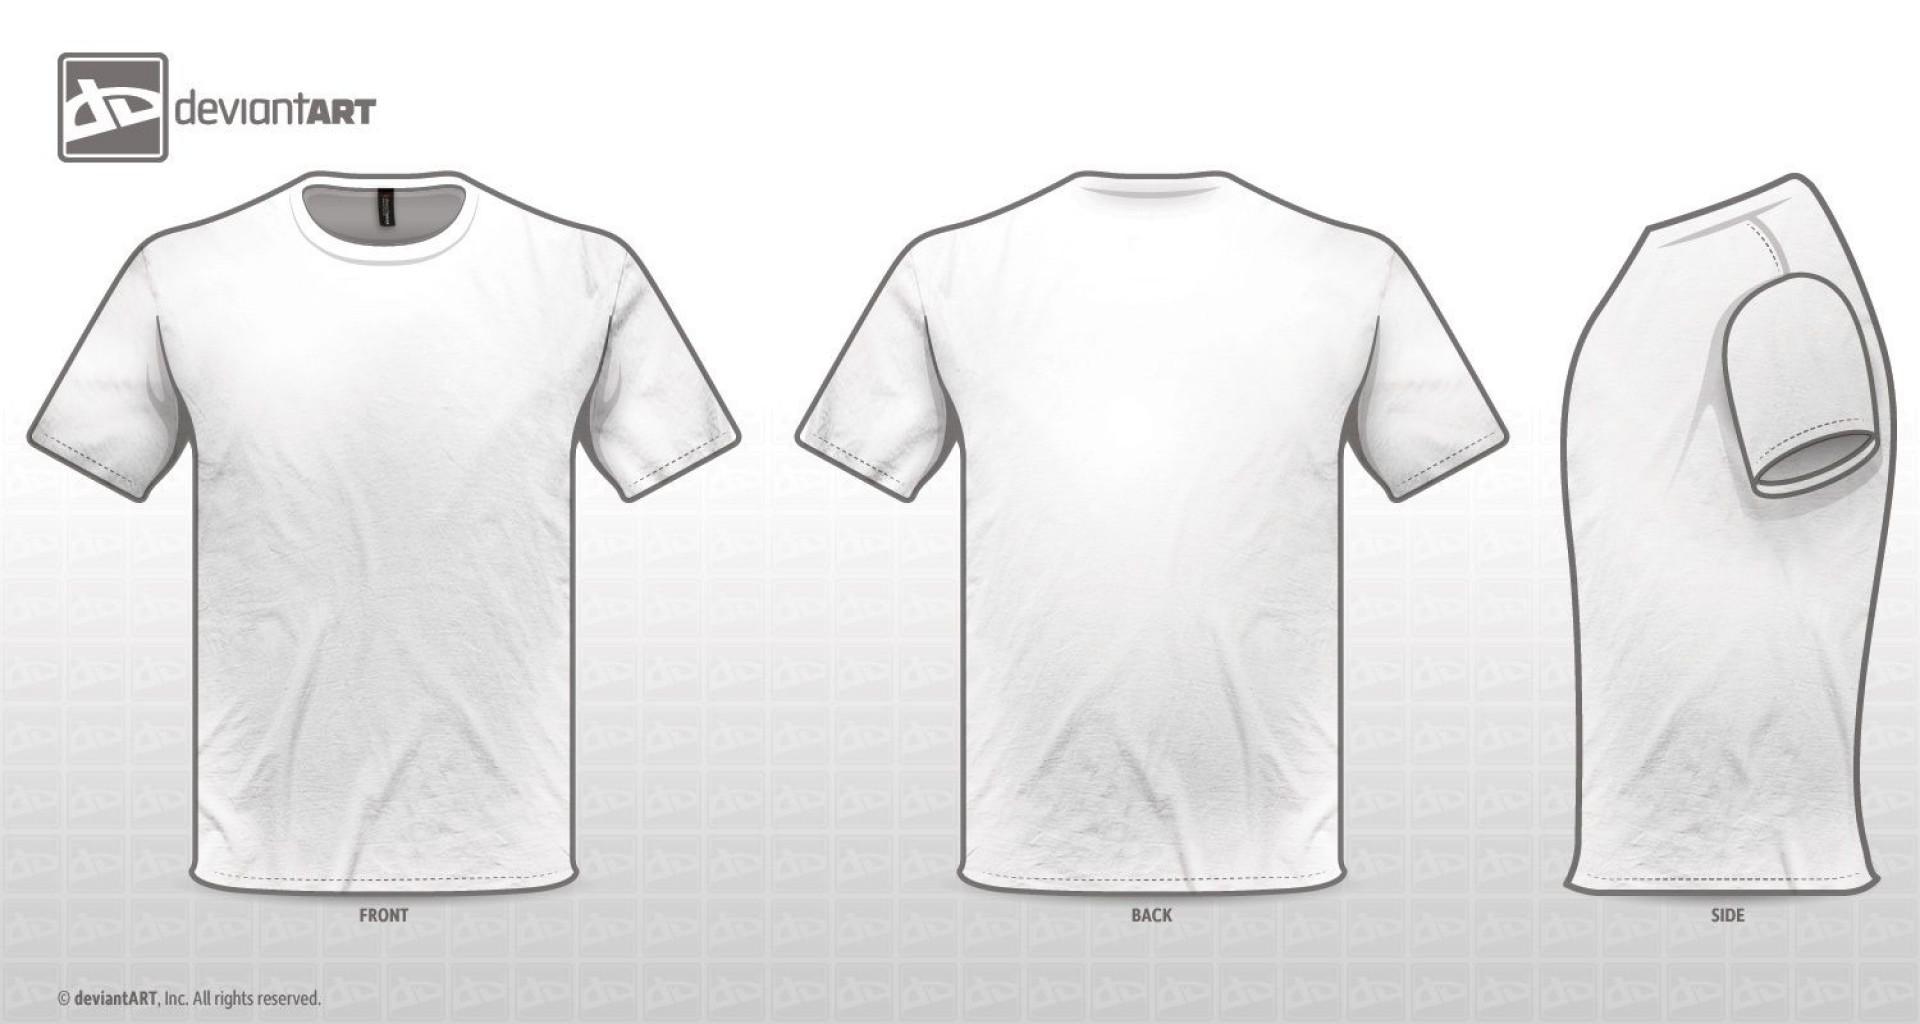 001 Surprising T Shirt Design Template Free High Def  Psd Download1920